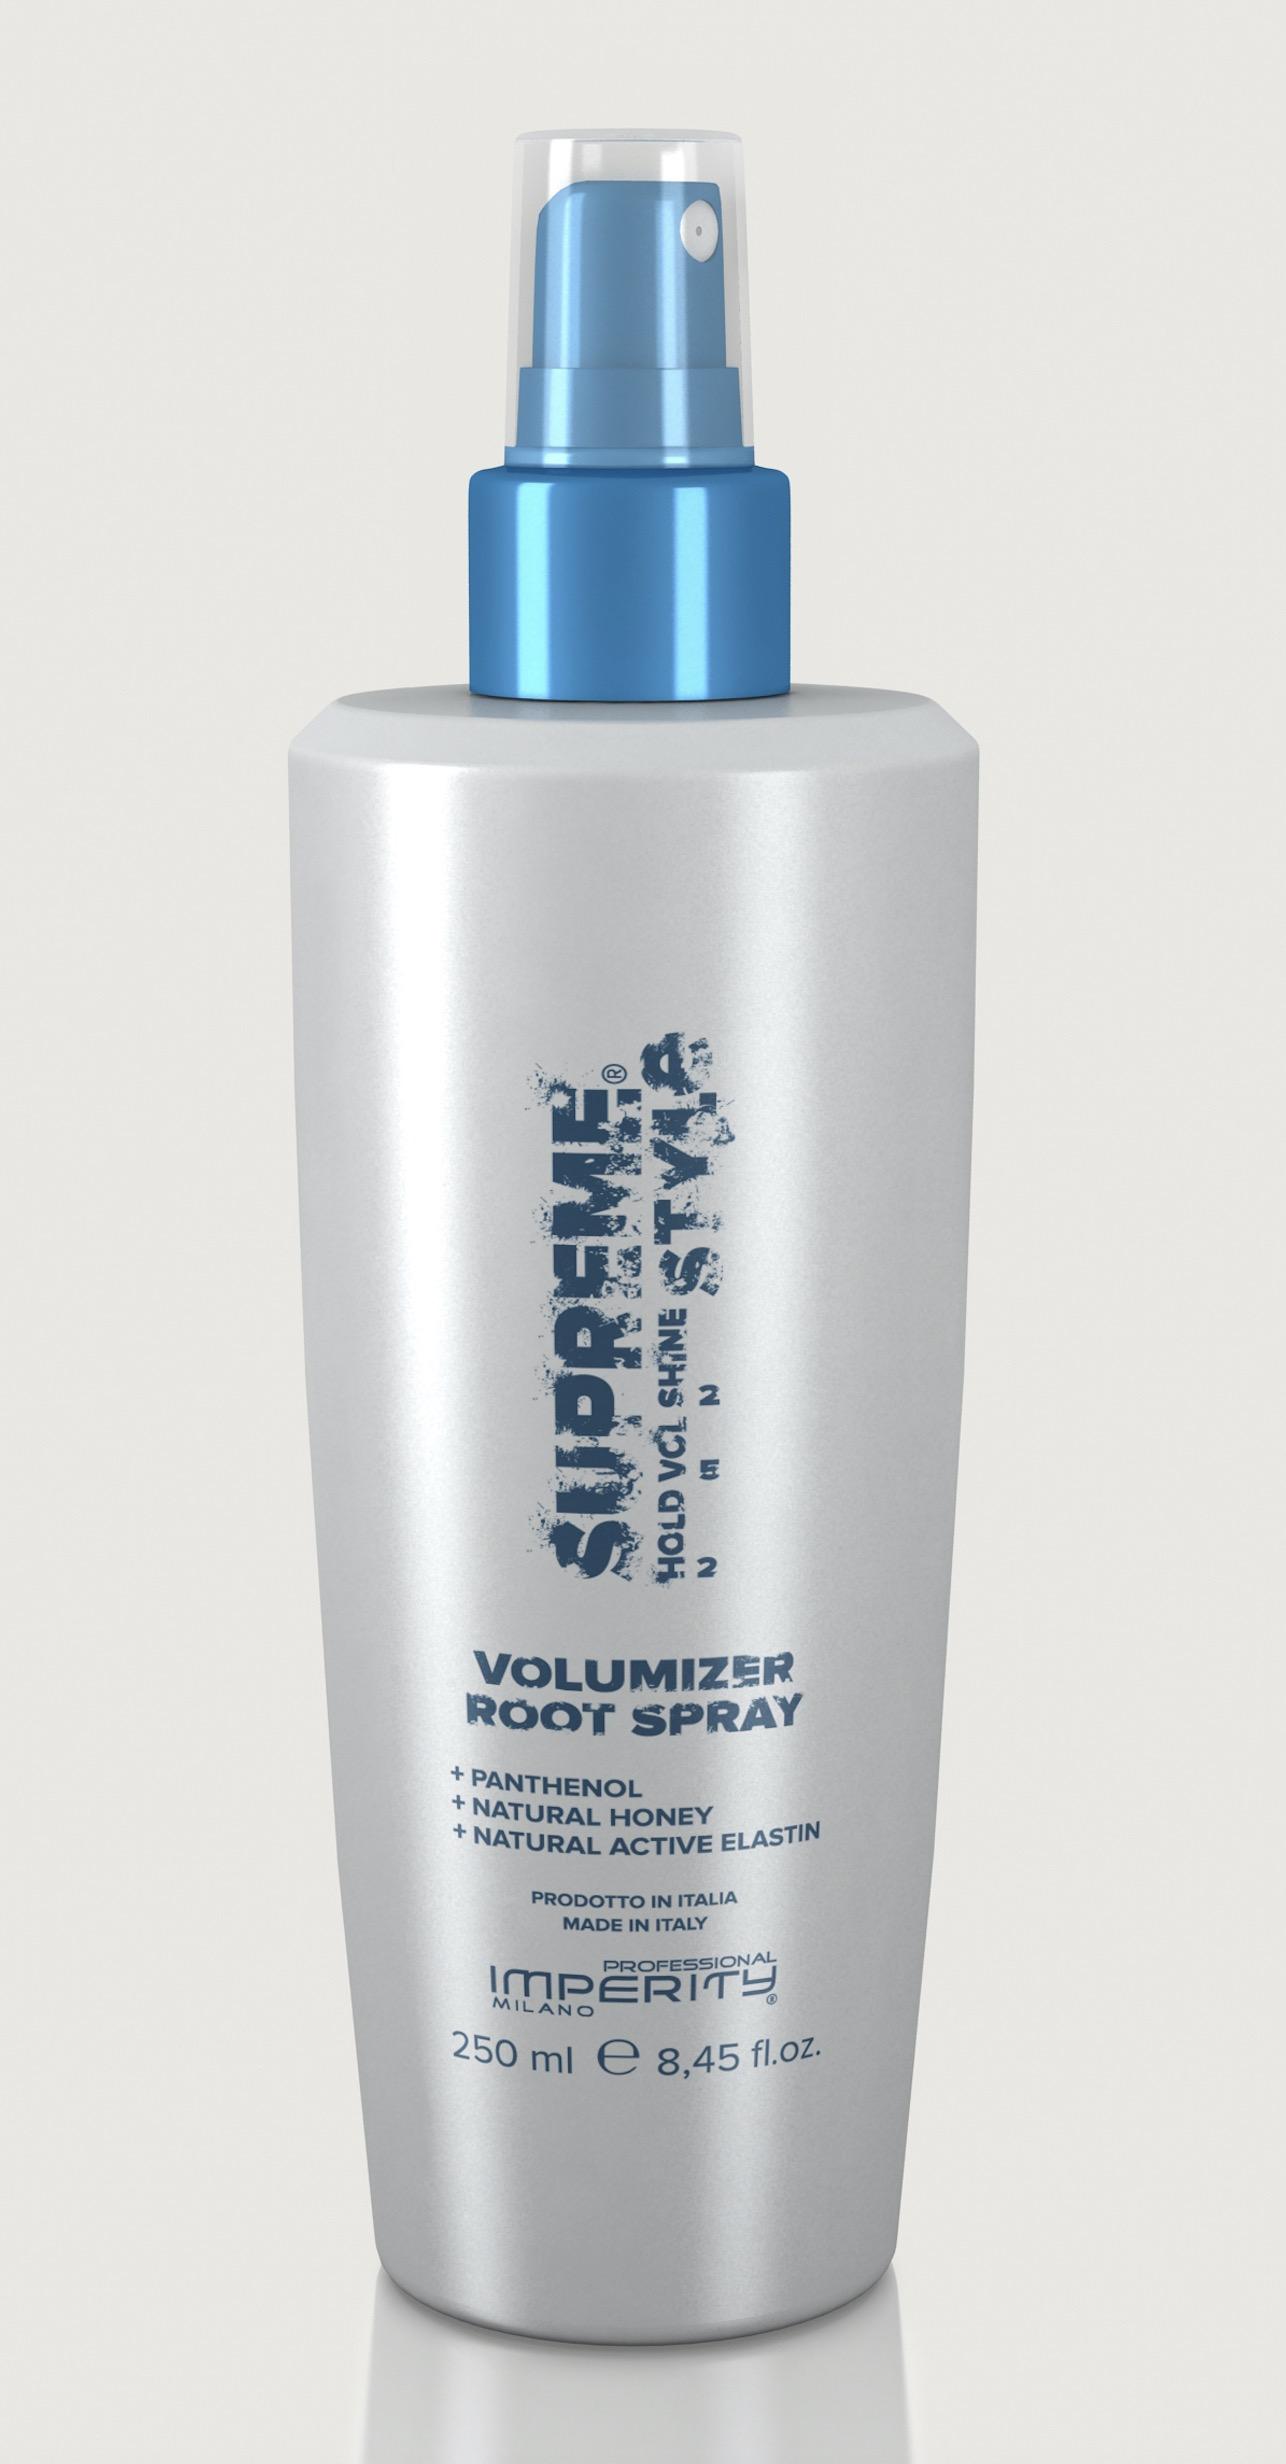 IMPERITY Supreme Style Volumizer Root Spray 250 ml empty 4db0303883